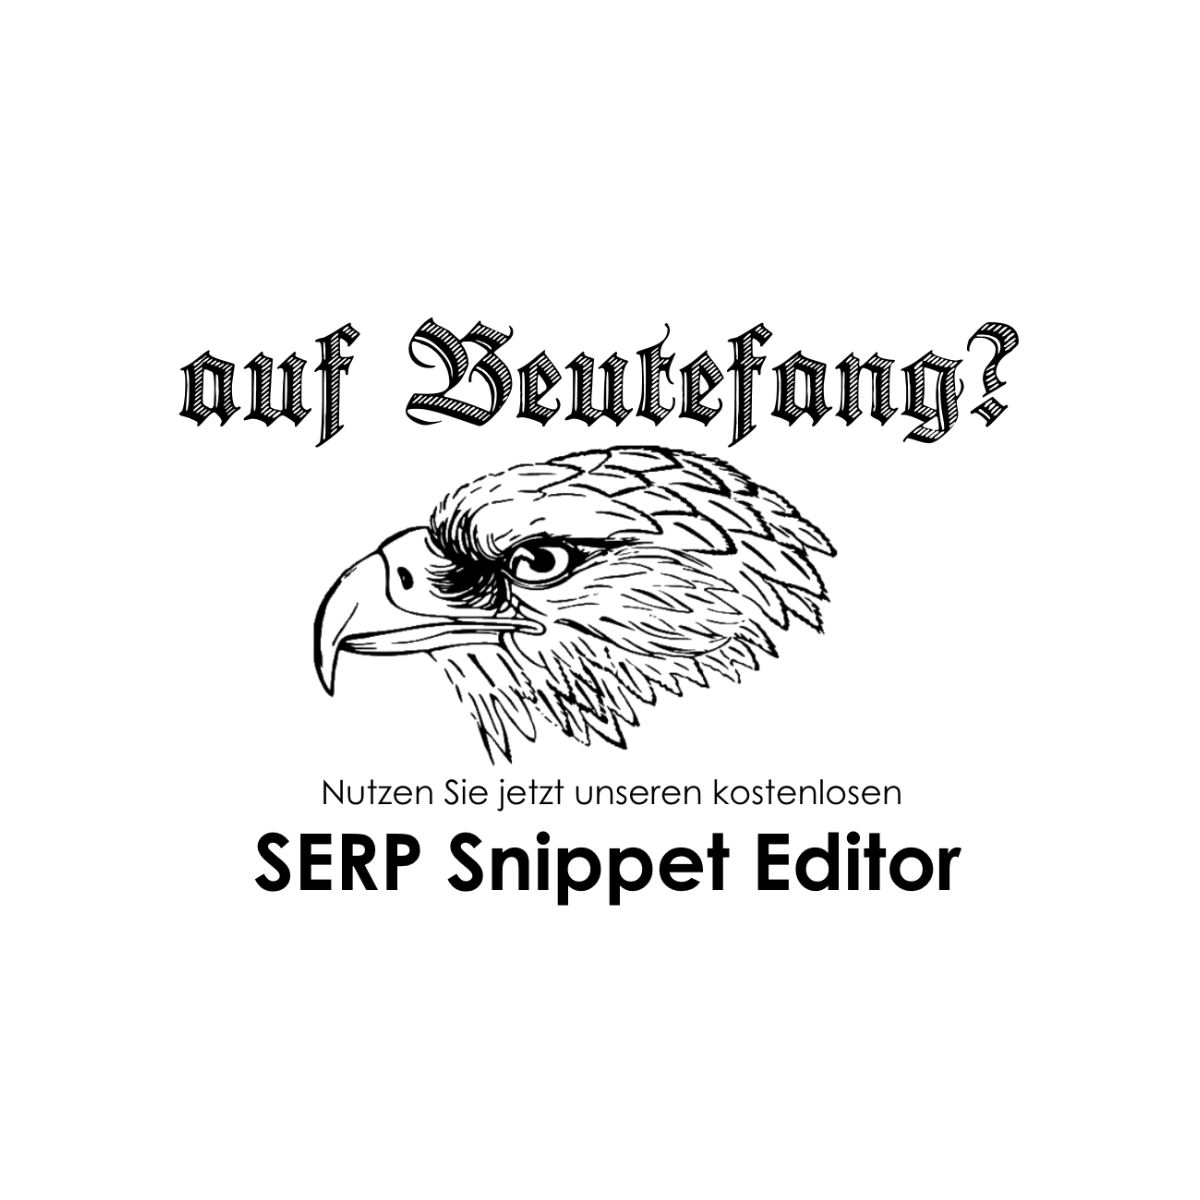 SERP Snippet Generator